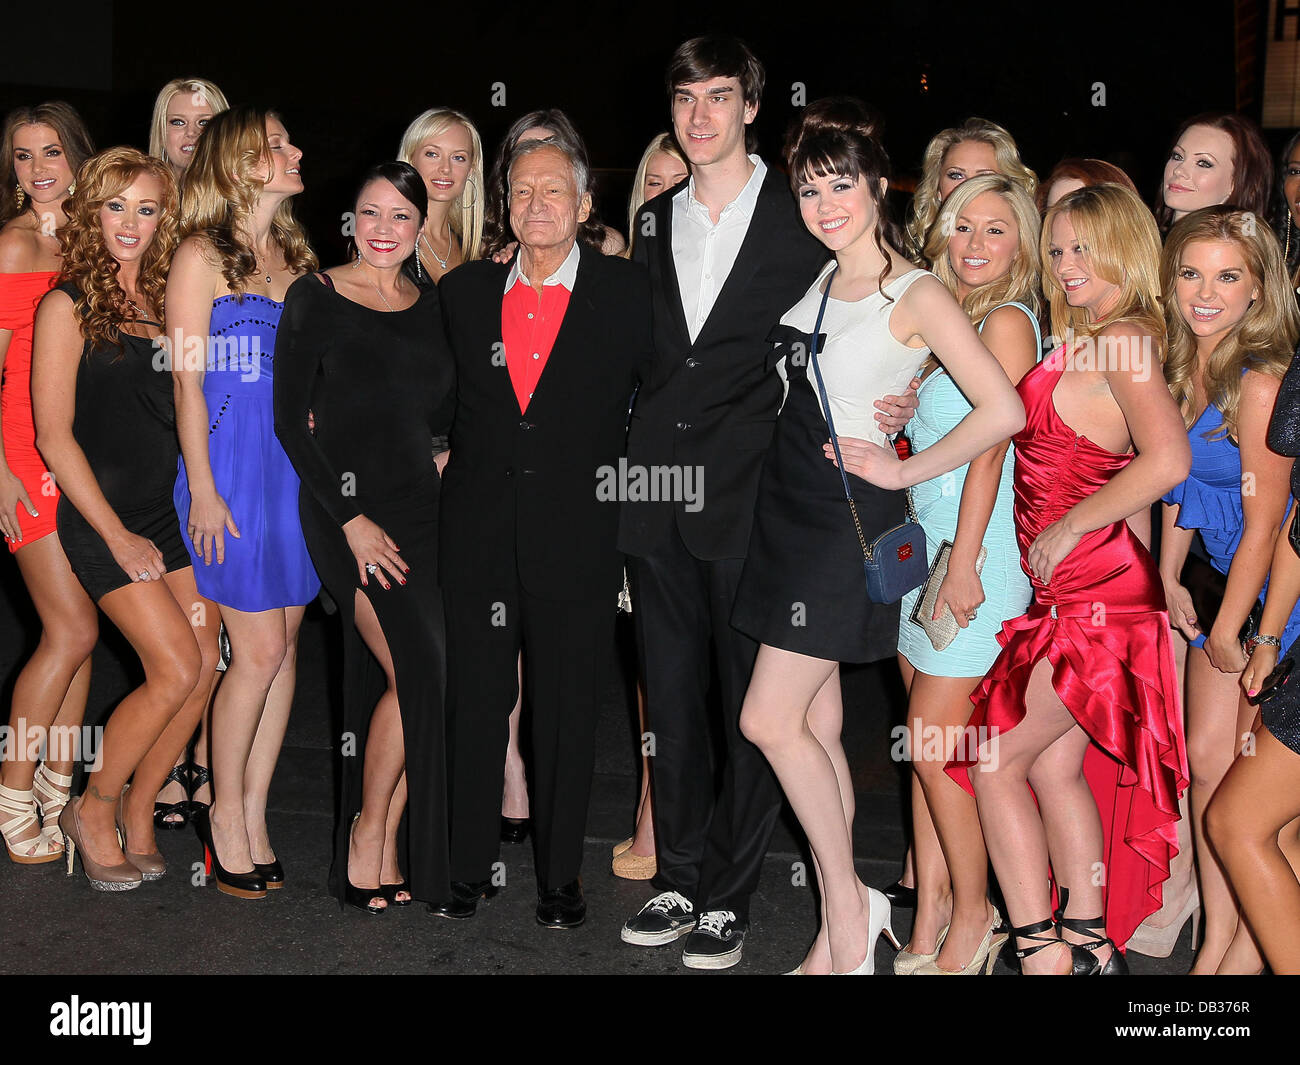 Playboy Hotel And Casino Las Vegas